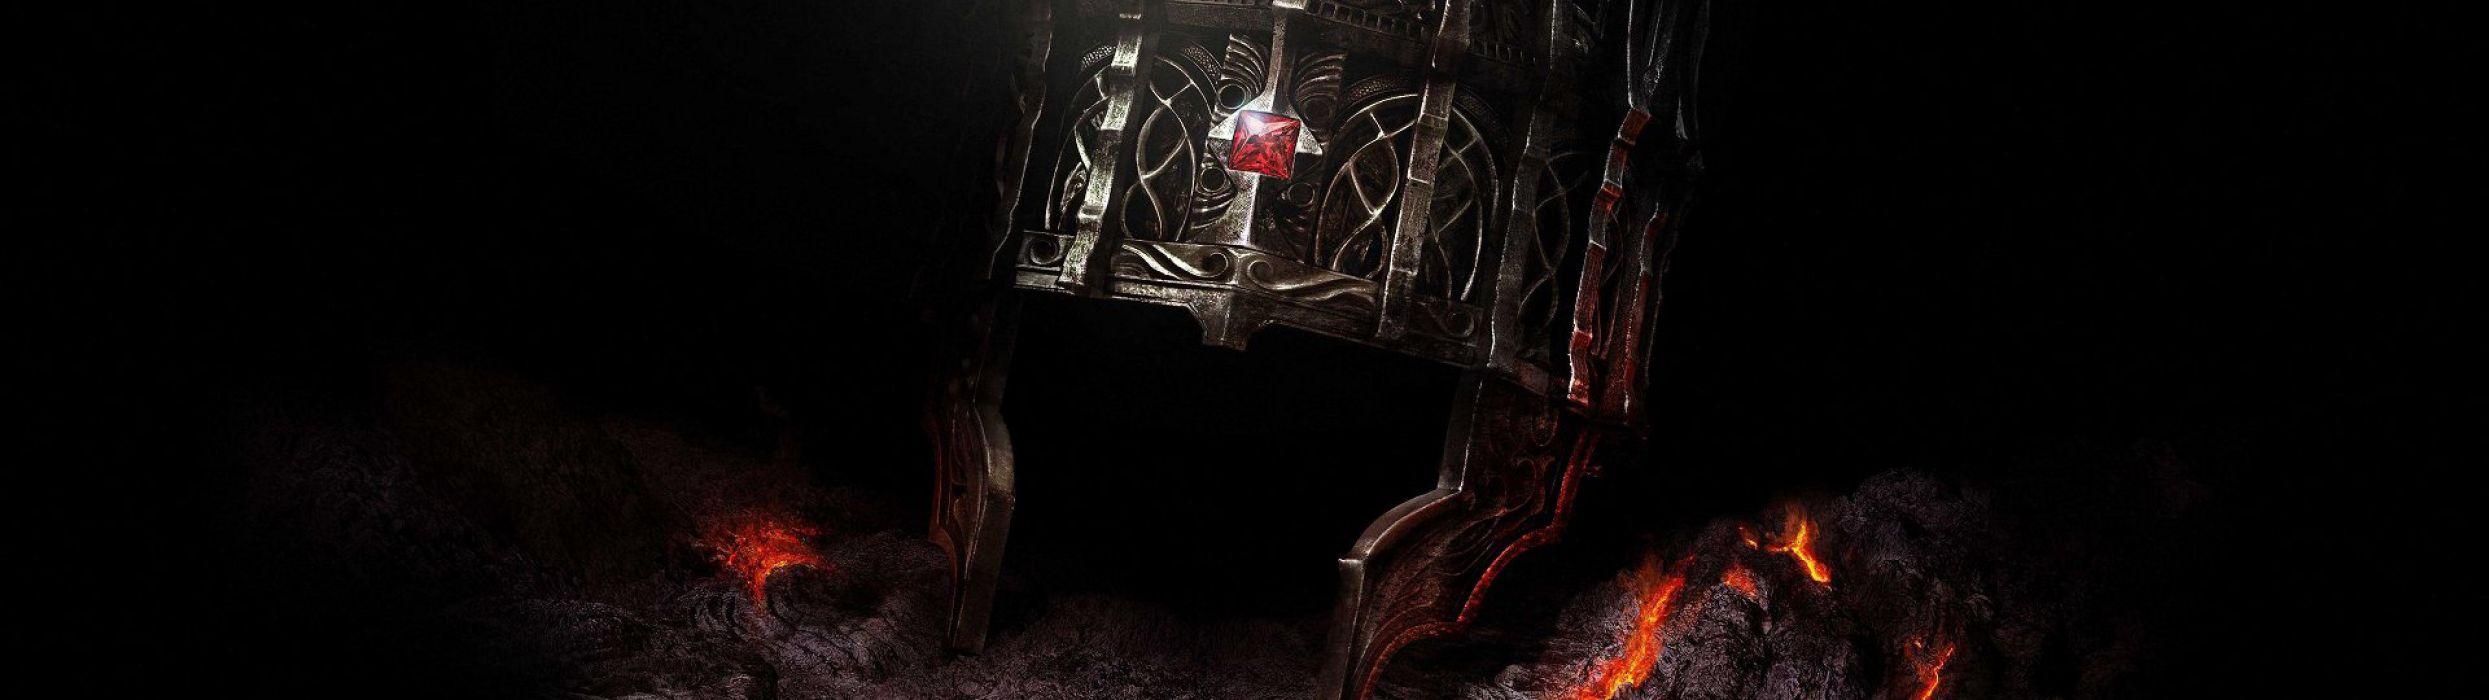 Dark Evil Horror Spooky Creepy Scary Wallpaper 3840x1080 804727 Wallpaperup